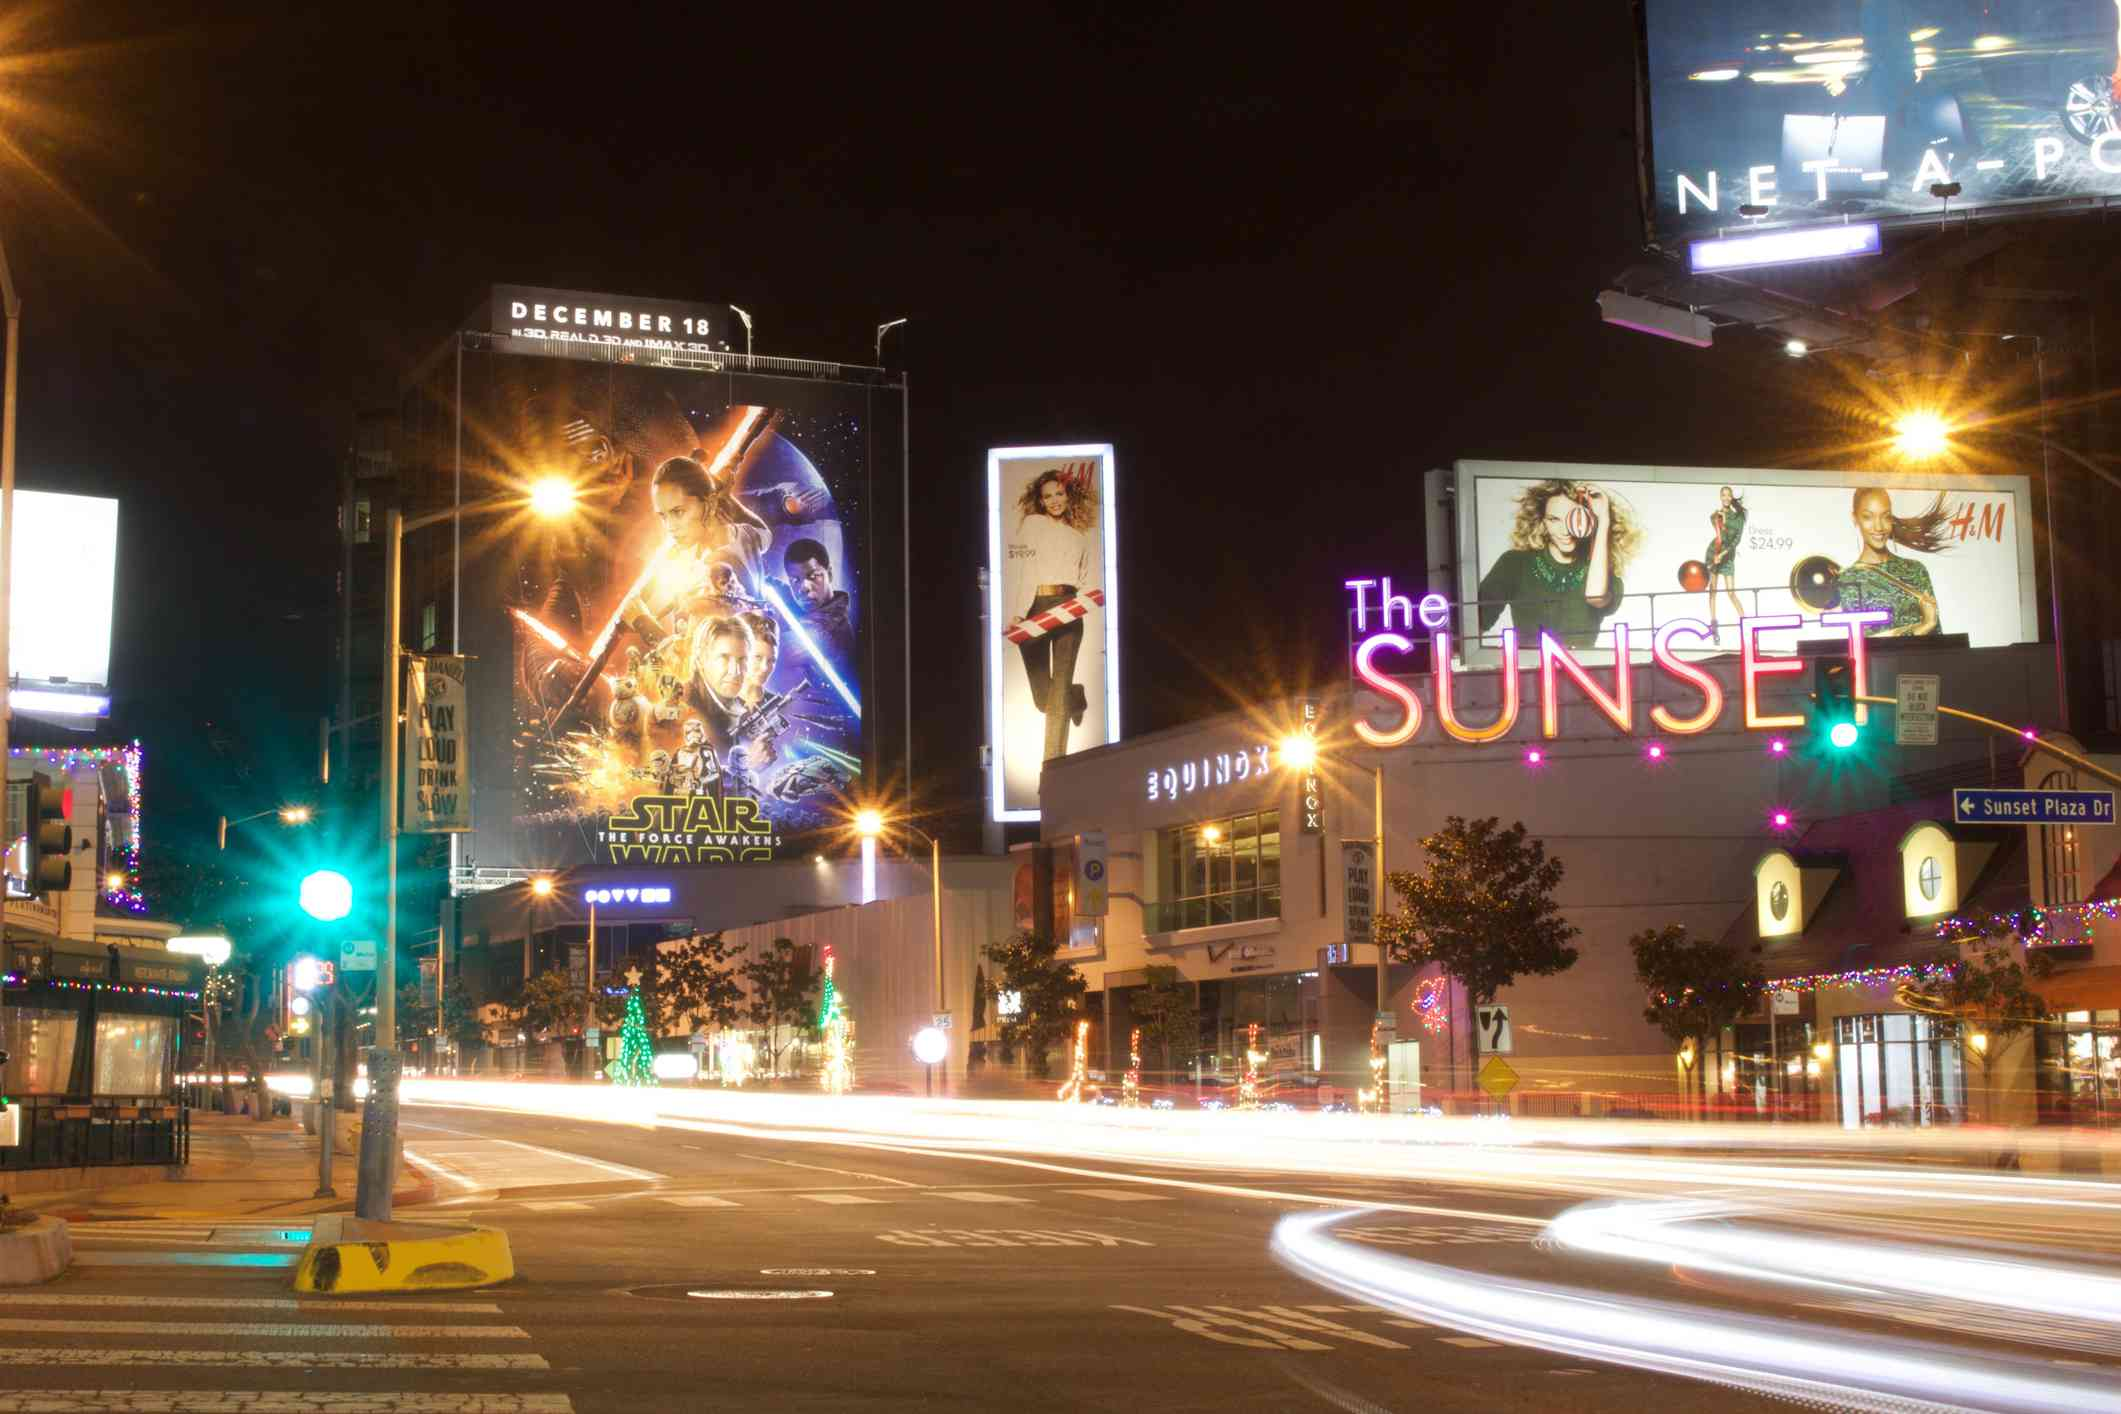 Evening on the Sunset Strip